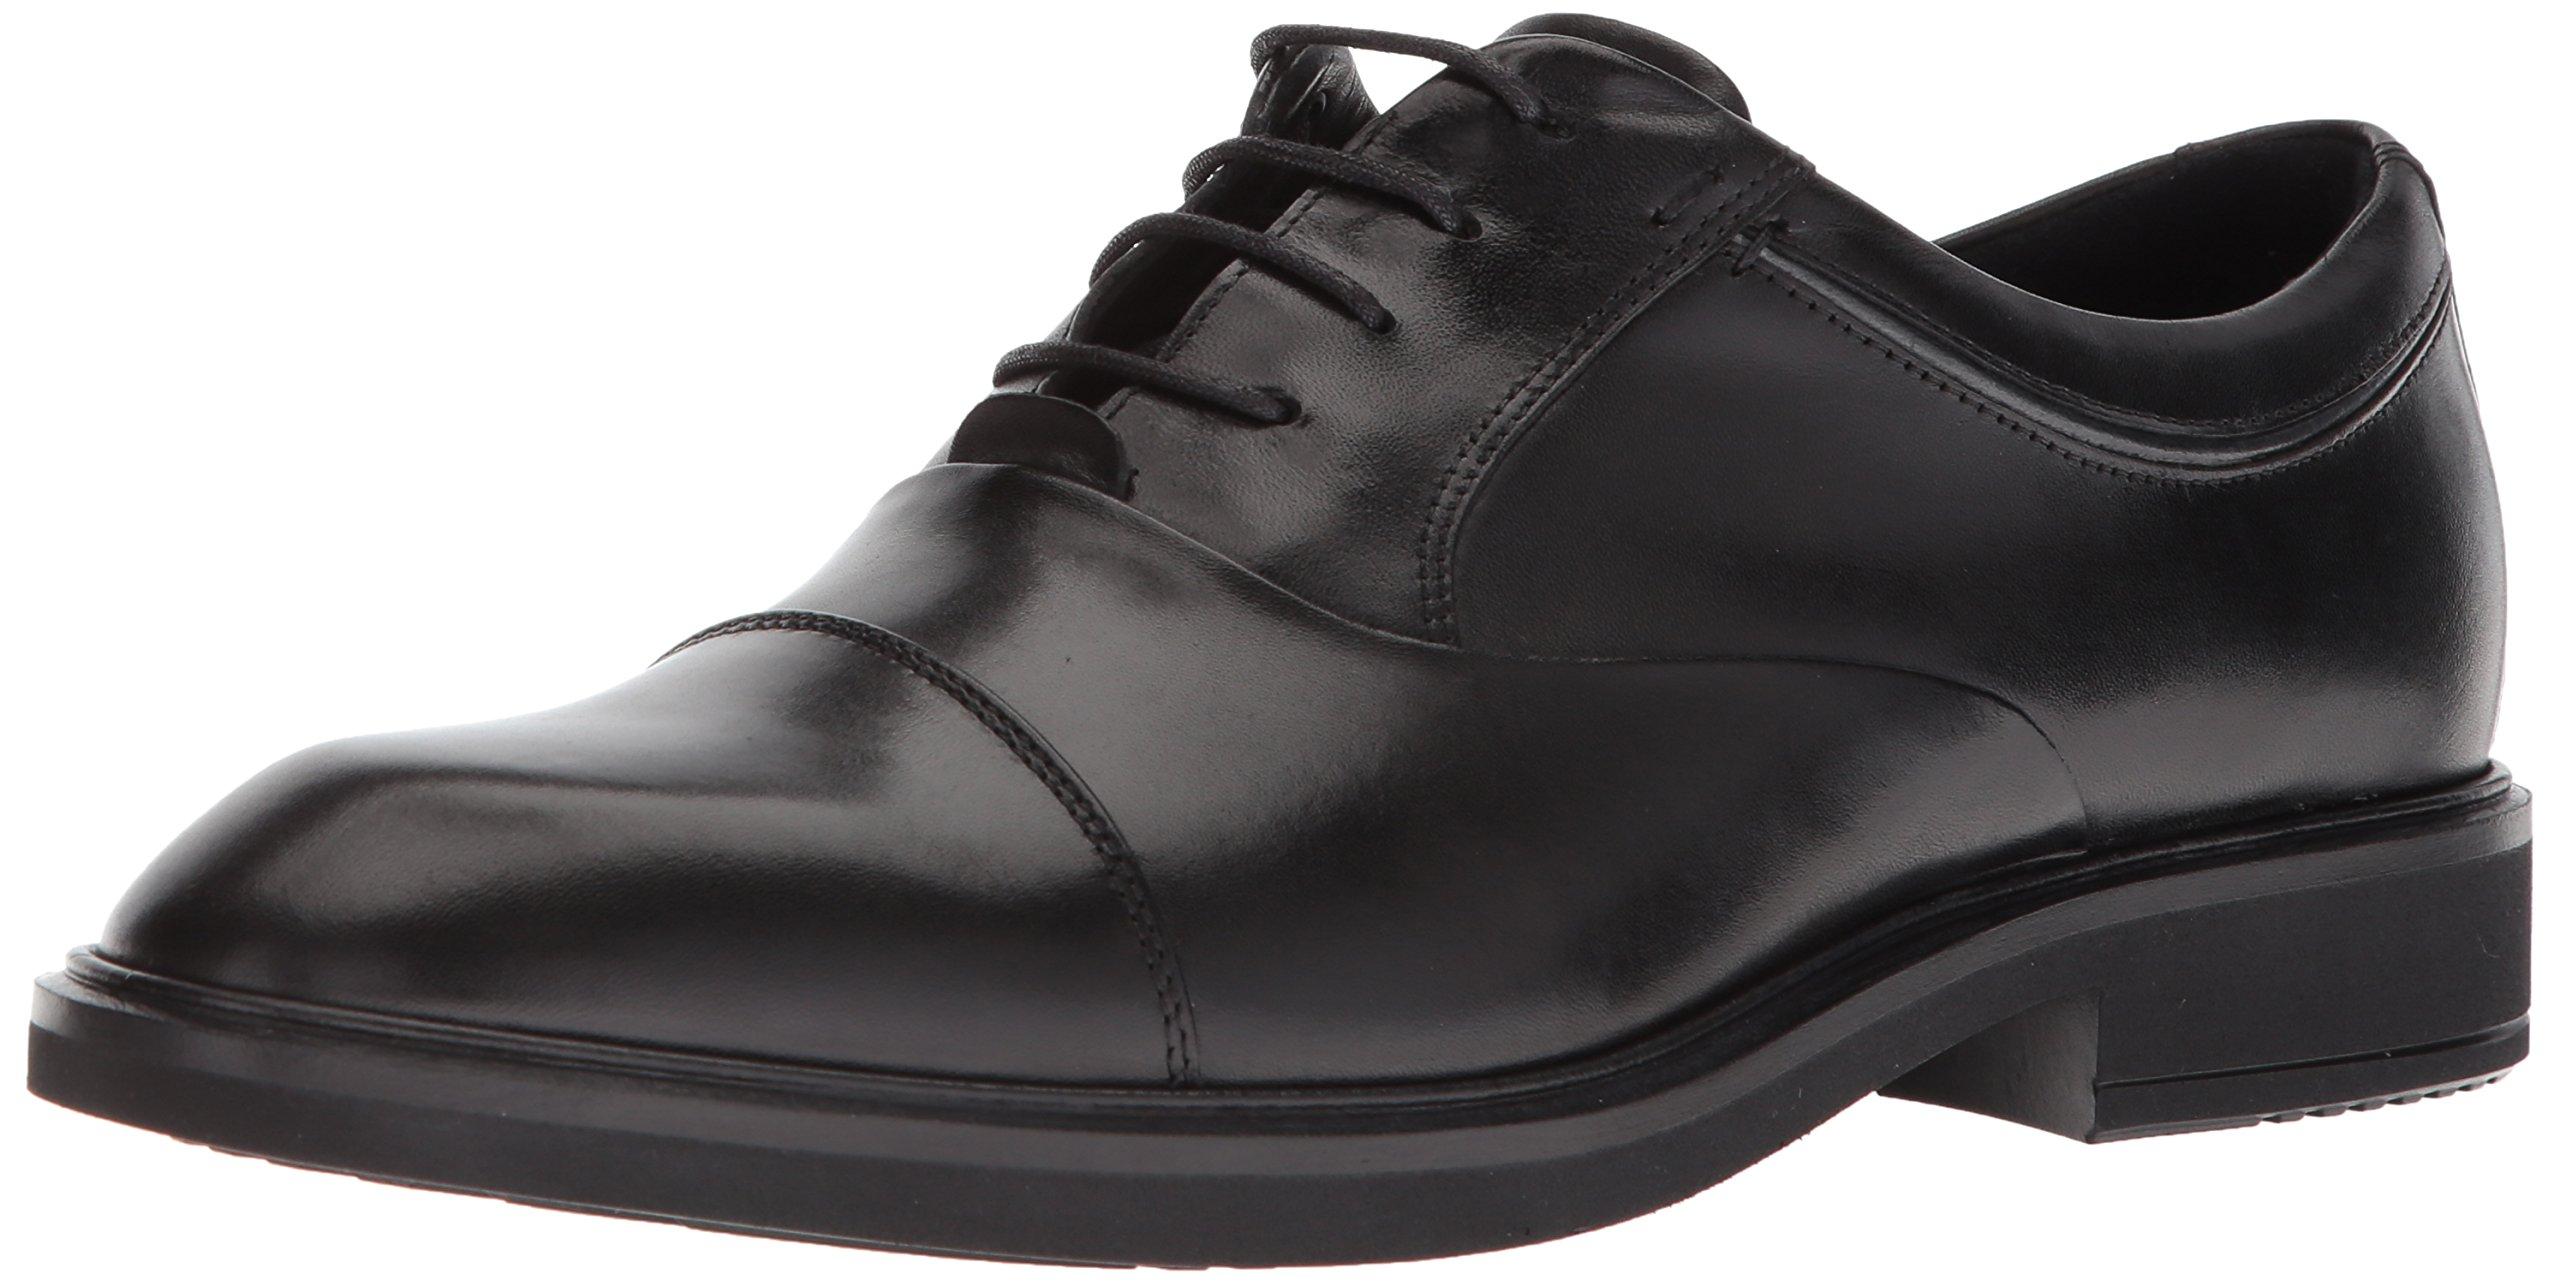 ECCO Men's Vitrus II Tie Oxford, Black Cap Toe, 45 M EU (11-11.5 US)